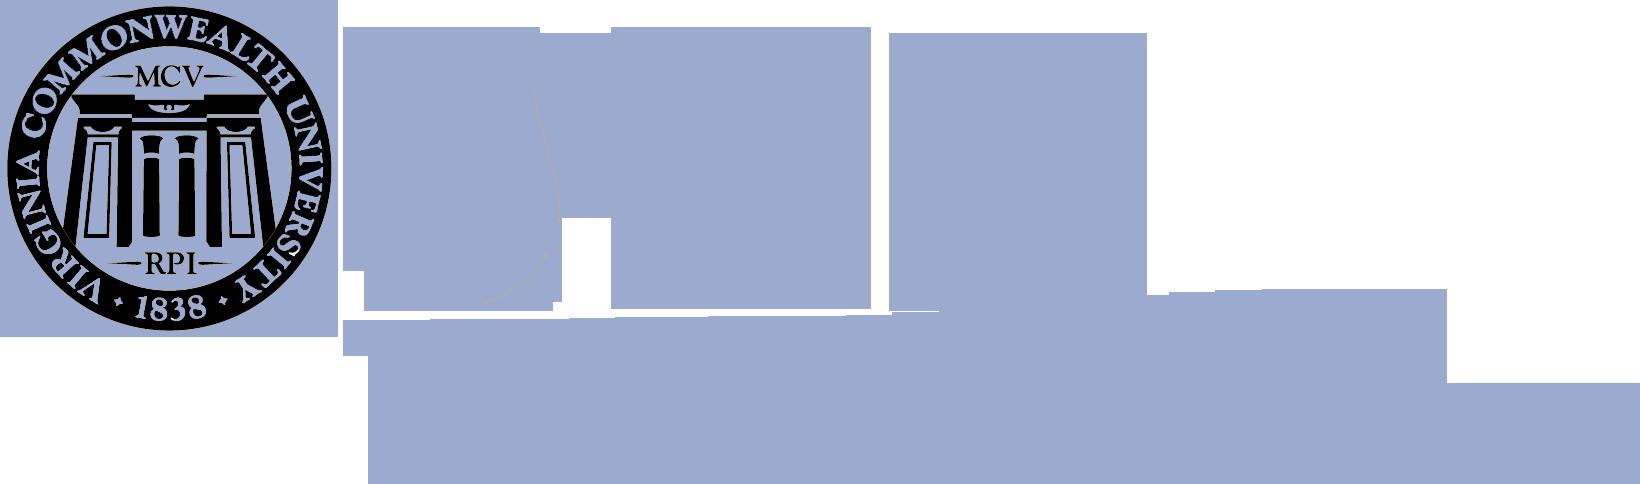 Conference_VCU Logo.png